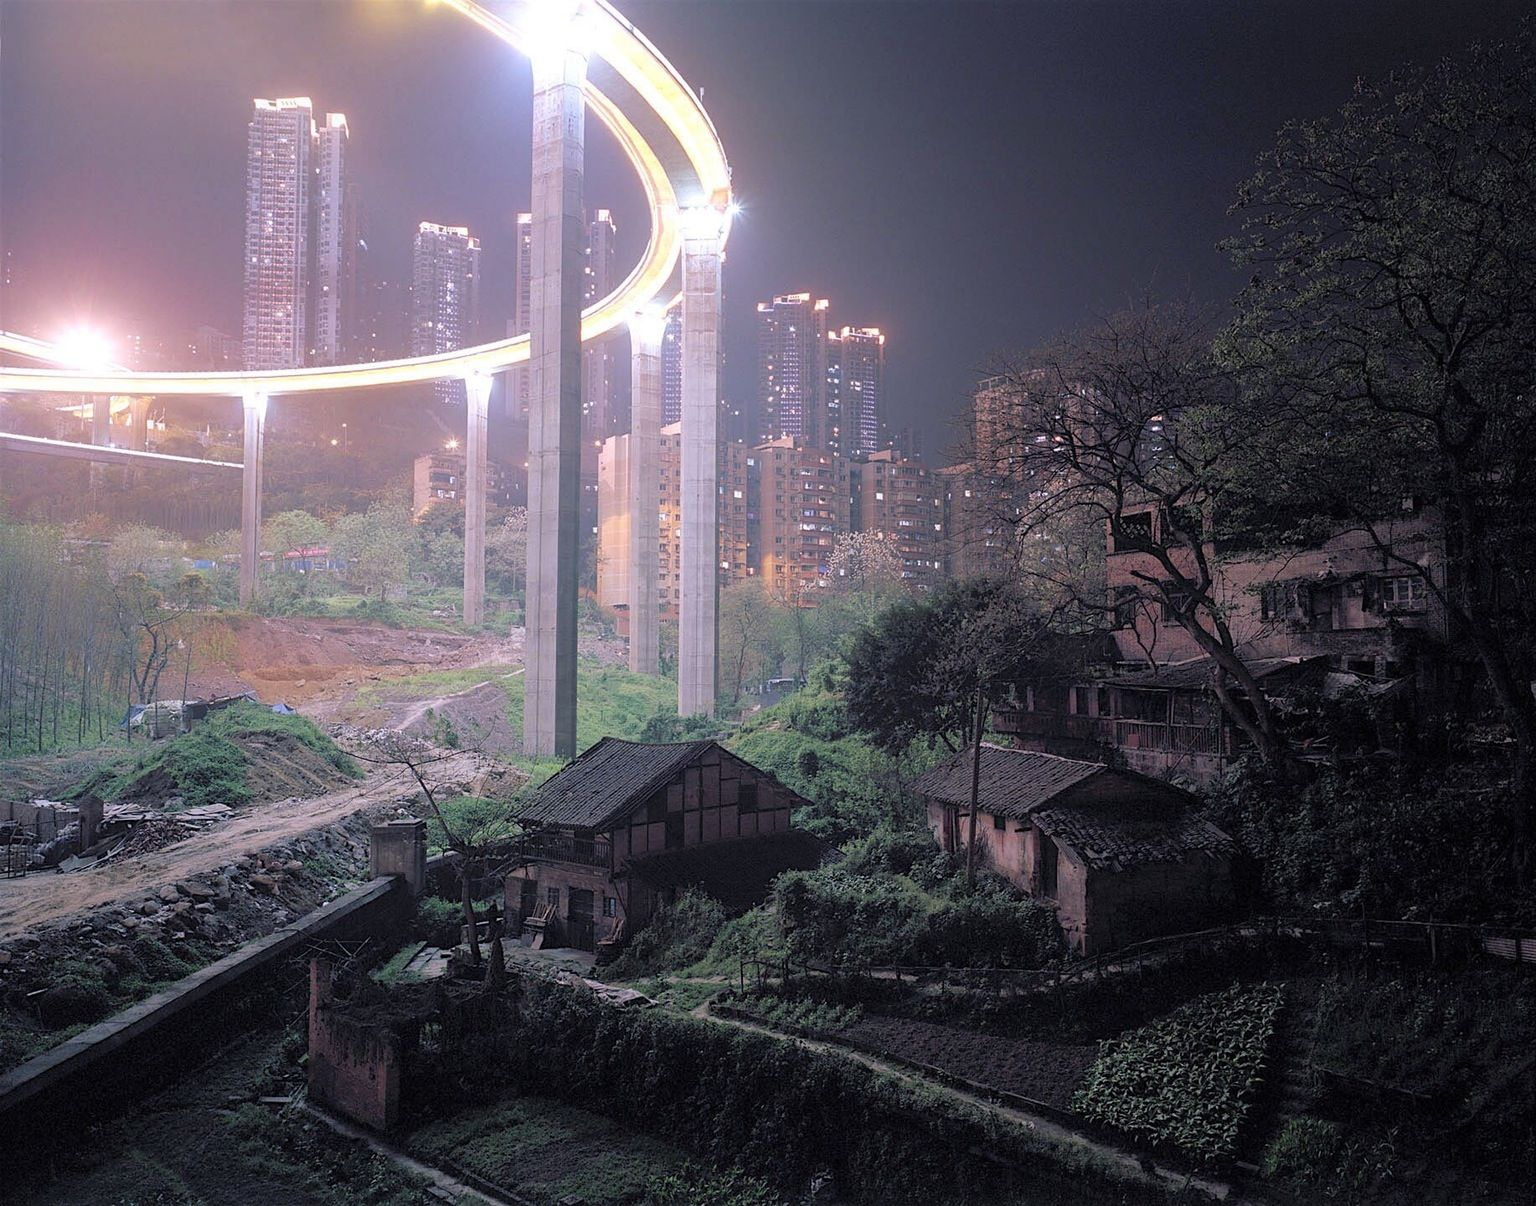 China Urban Rural Interesting Thynges Pinterest # Muebles Ucero Soria